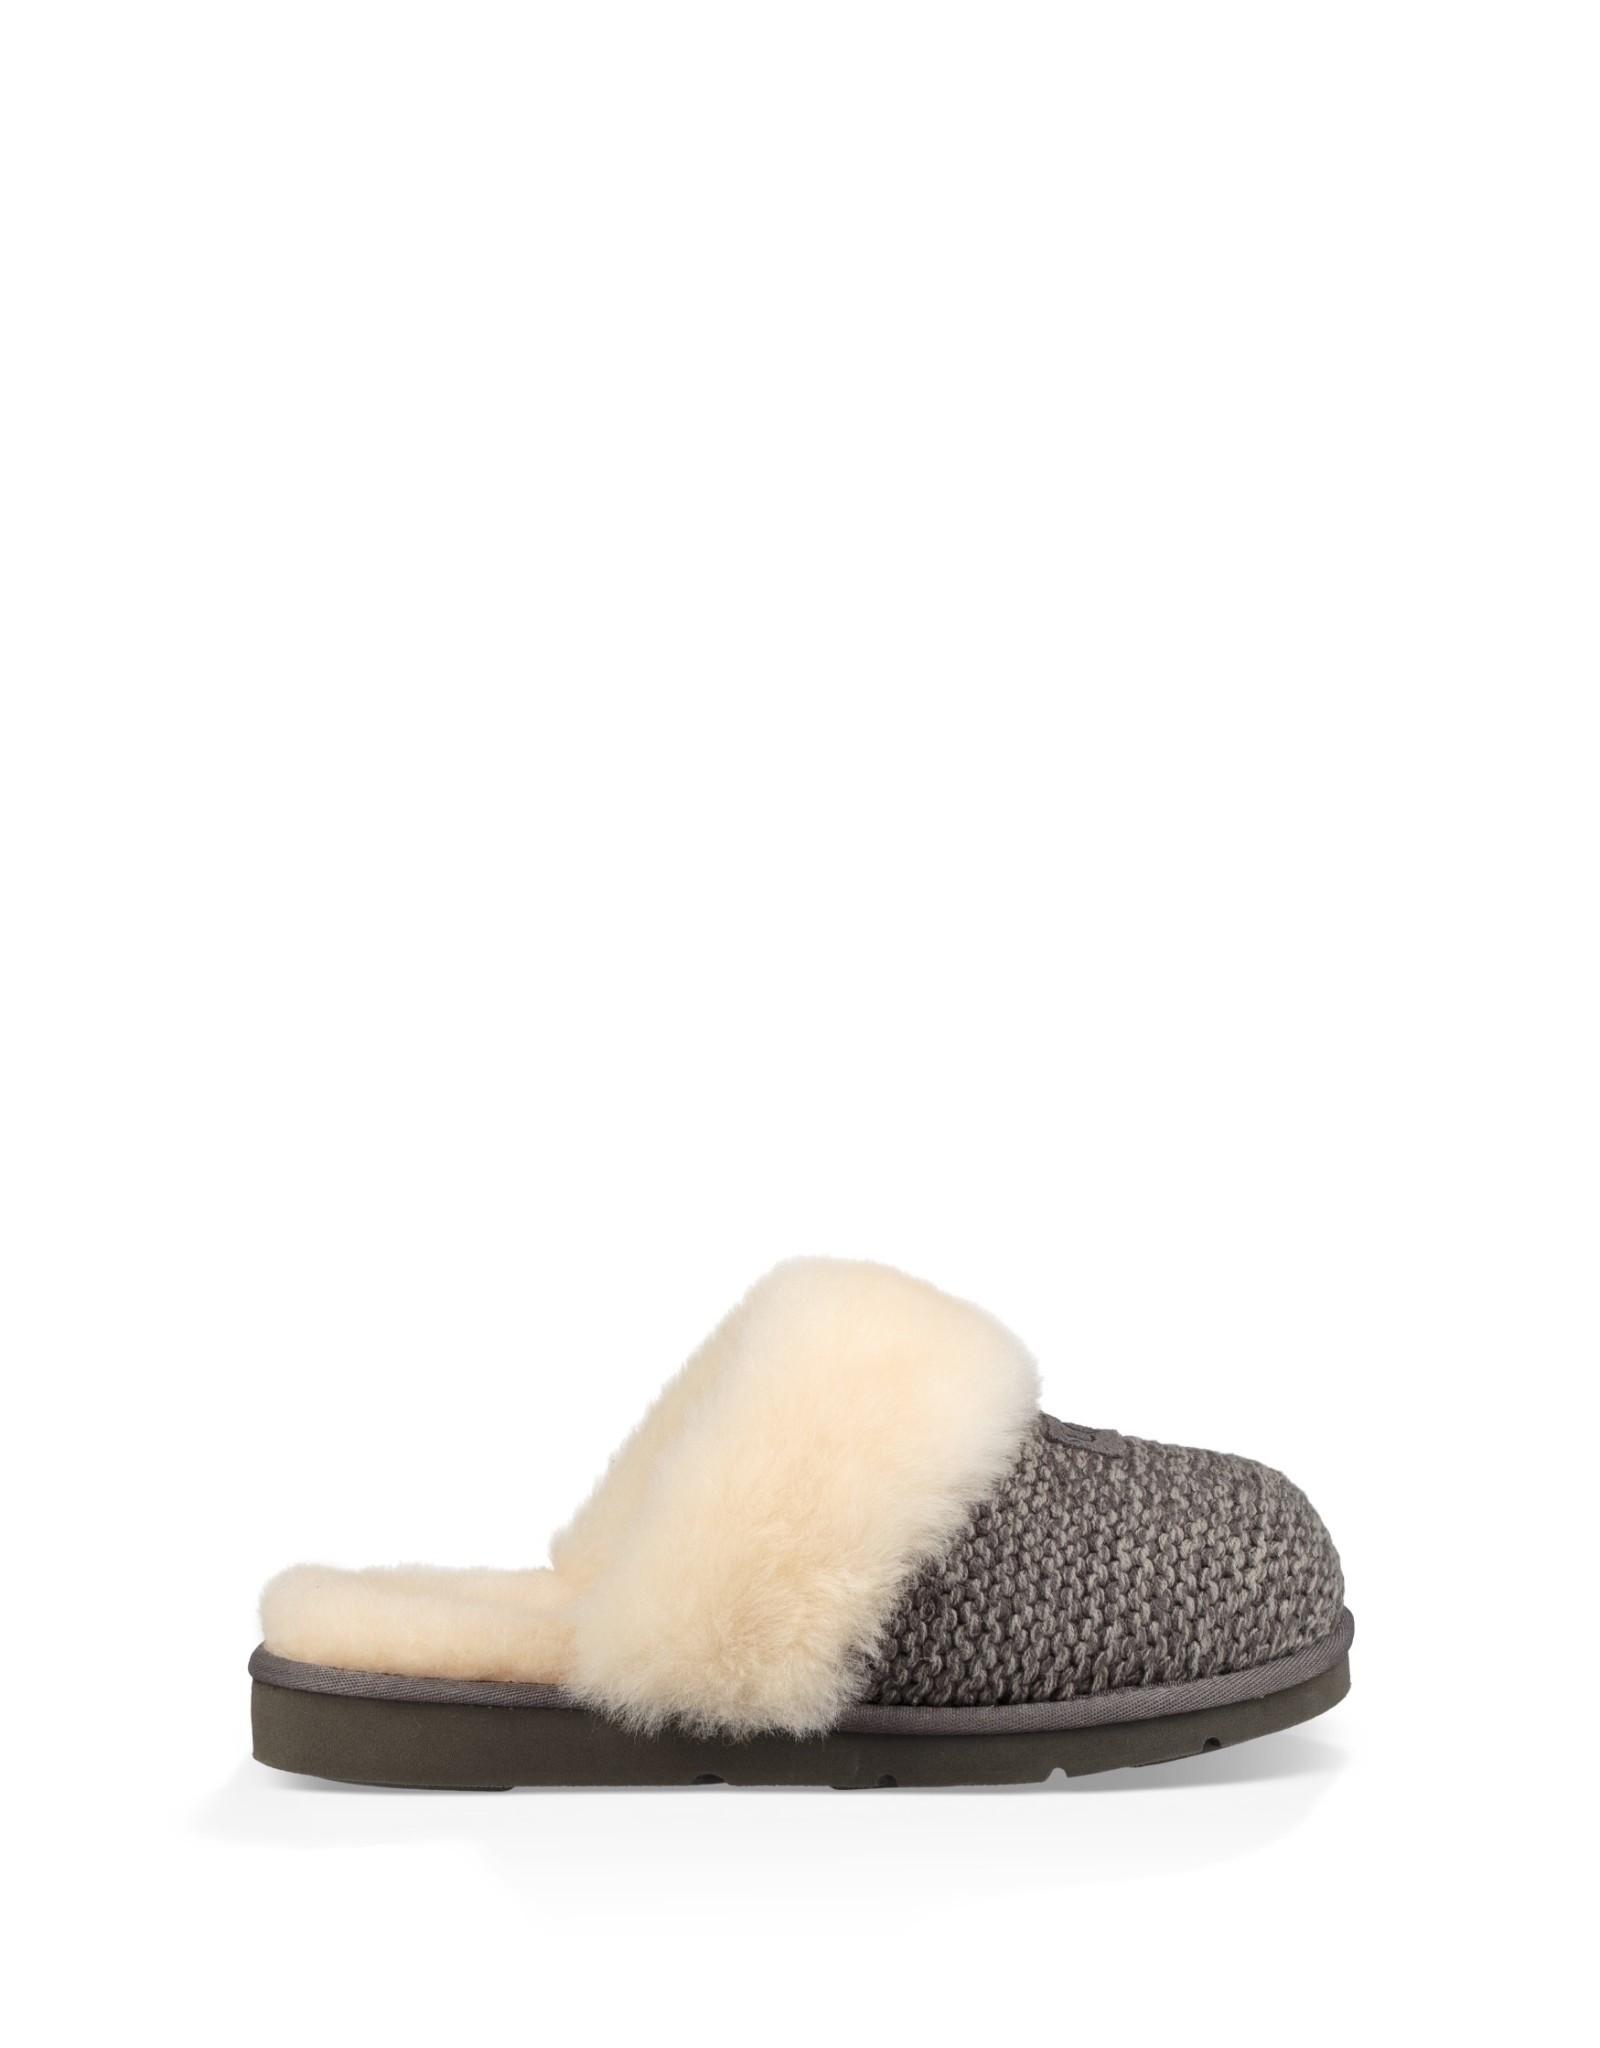 Ugg Ugg Cozy Knit Slipper Ladies'